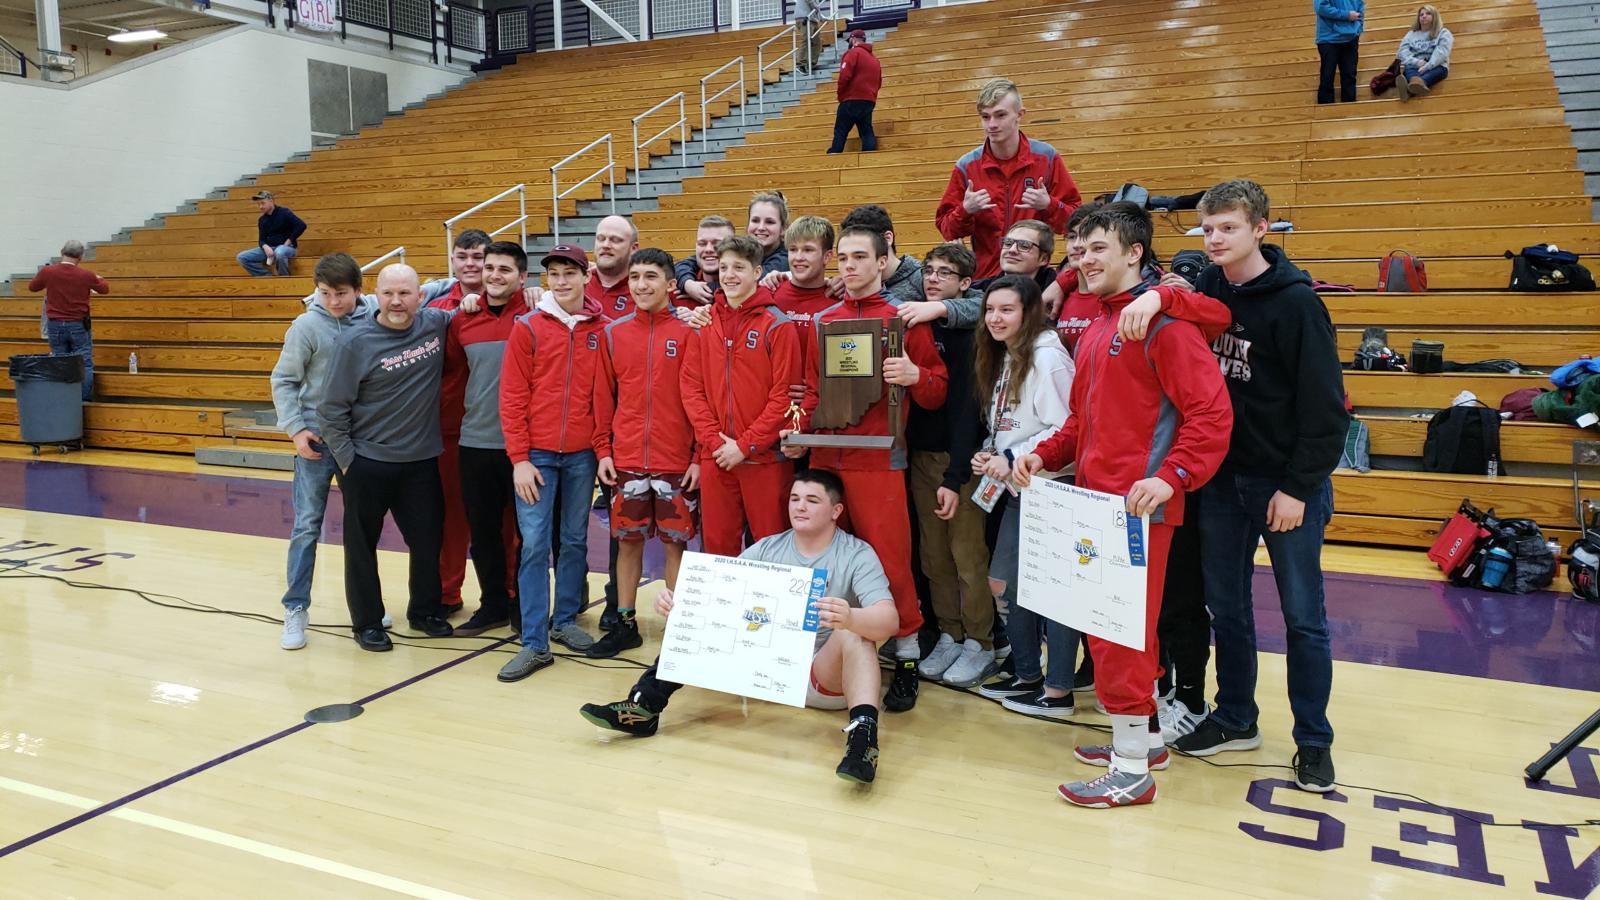 Wrestling Win Terre Haute's First Regional Championship